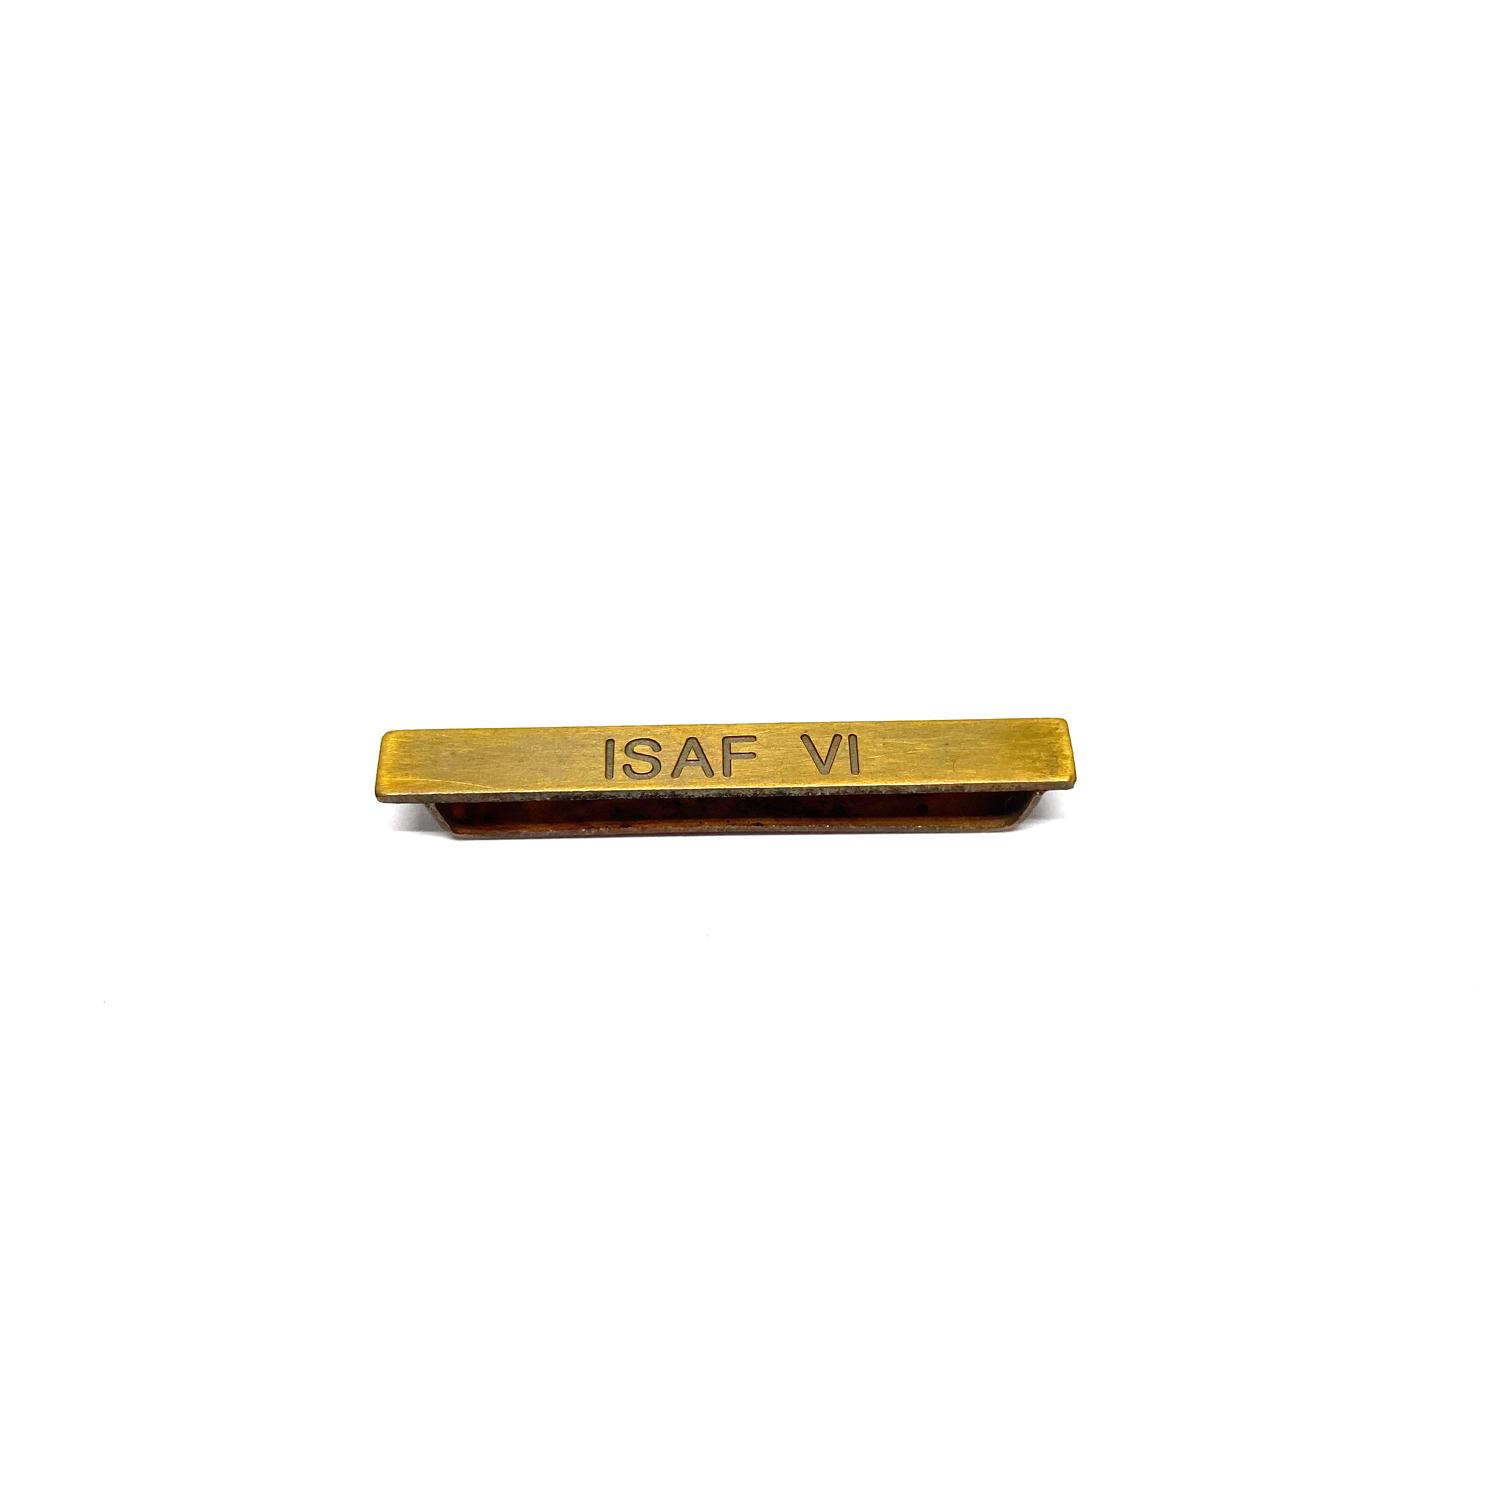 Bar ISAF VI for military medals